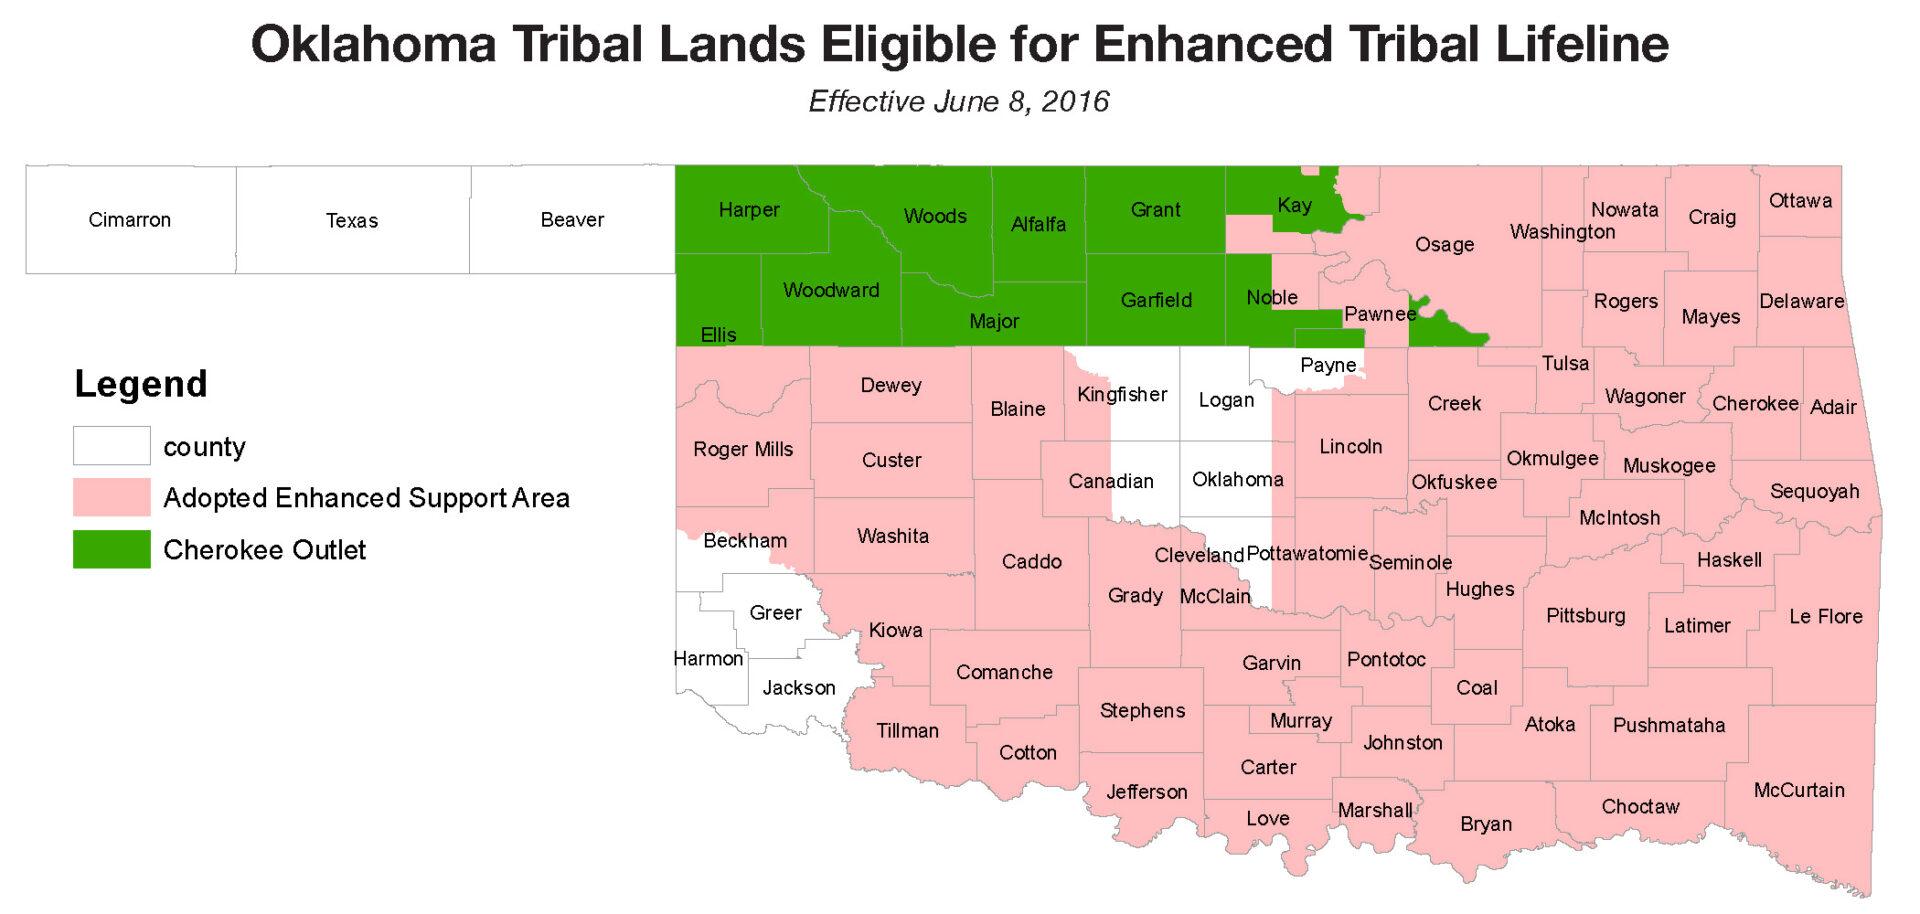 OKLAHOMA TRIBAL LAND REALLOCATION FOR Lifeline